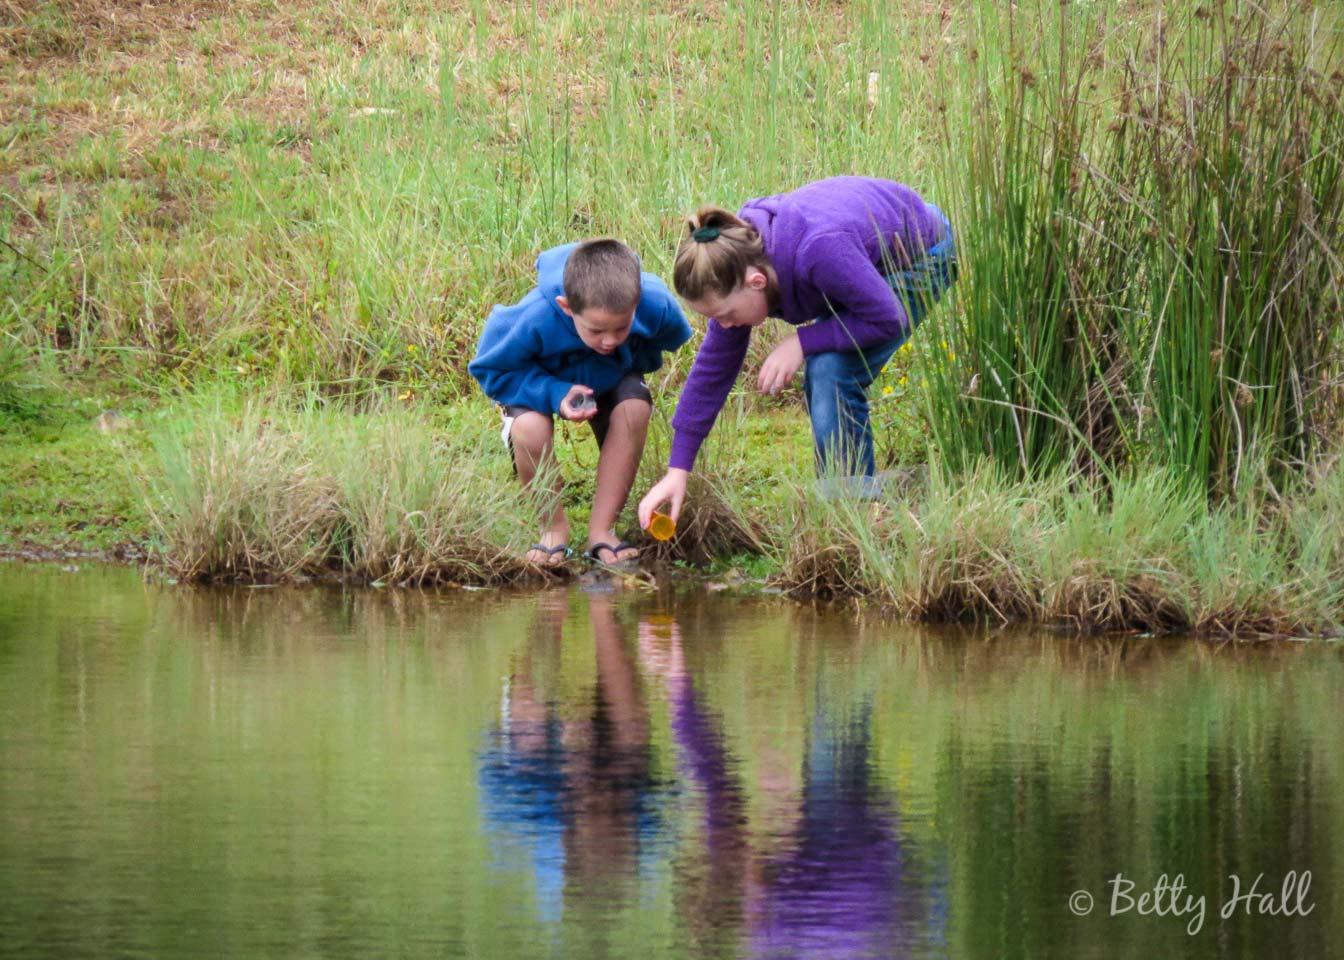 Children exploring a pond